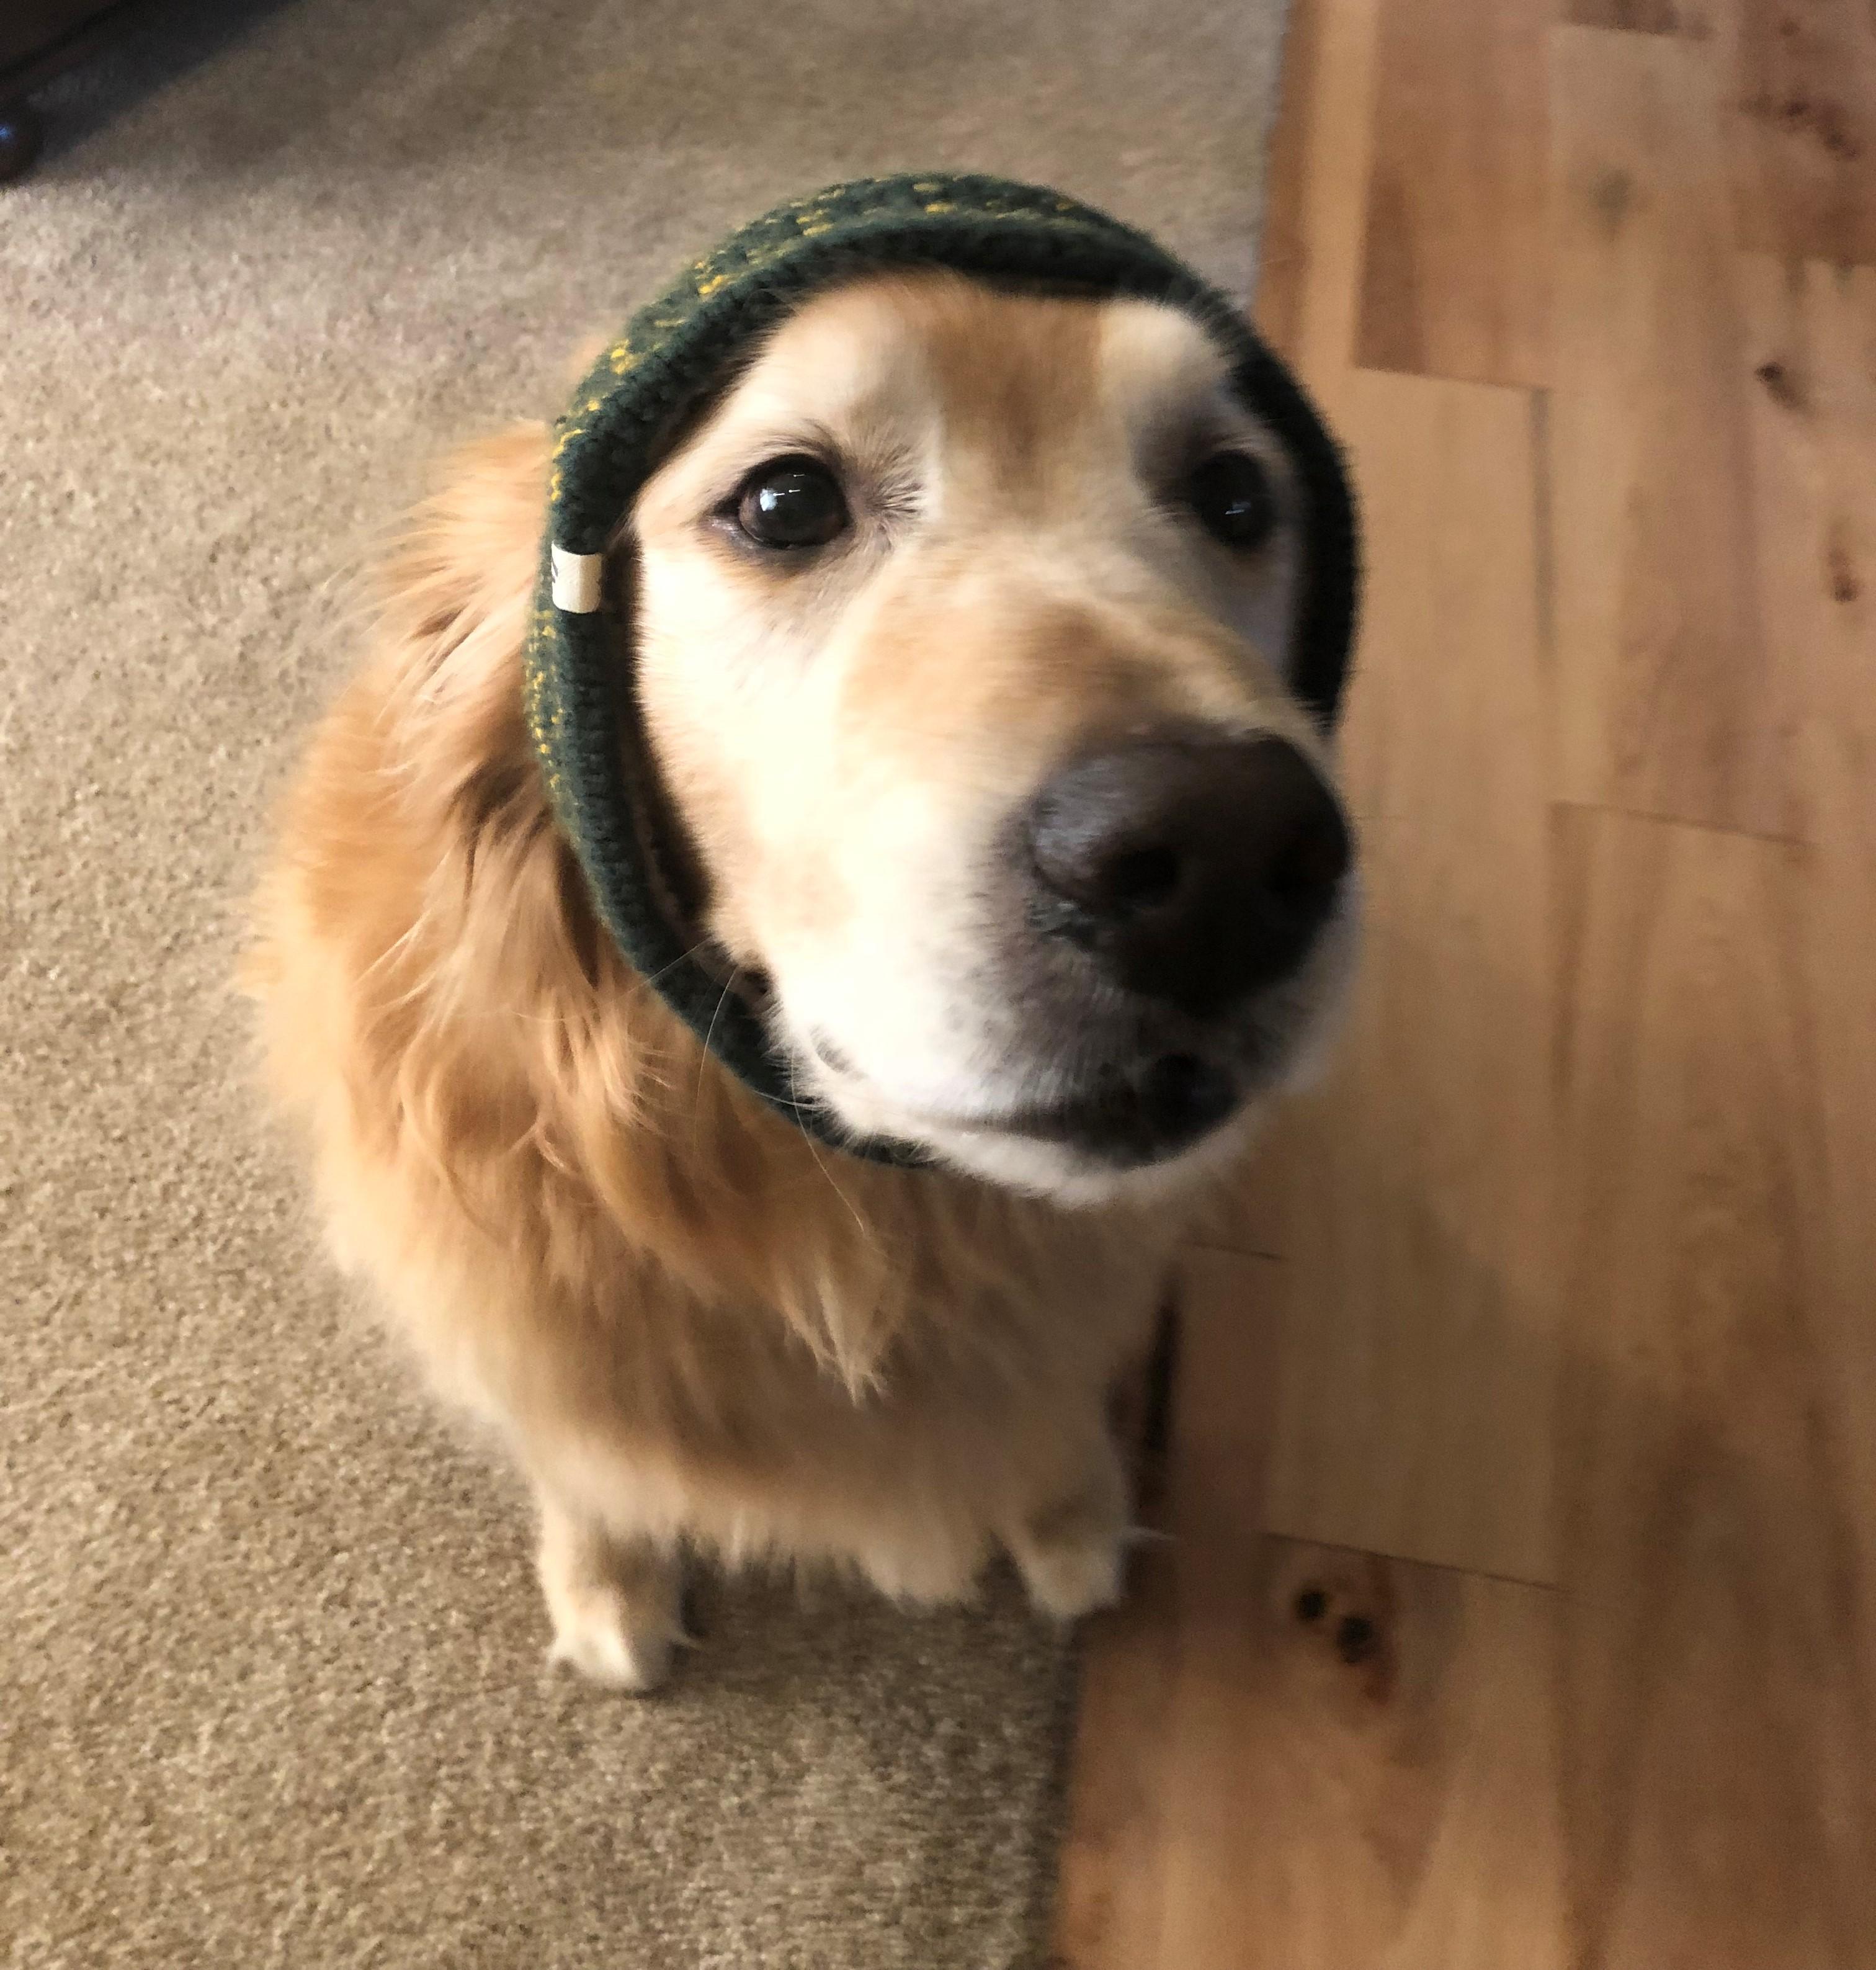 Keeping your dog's ears warm